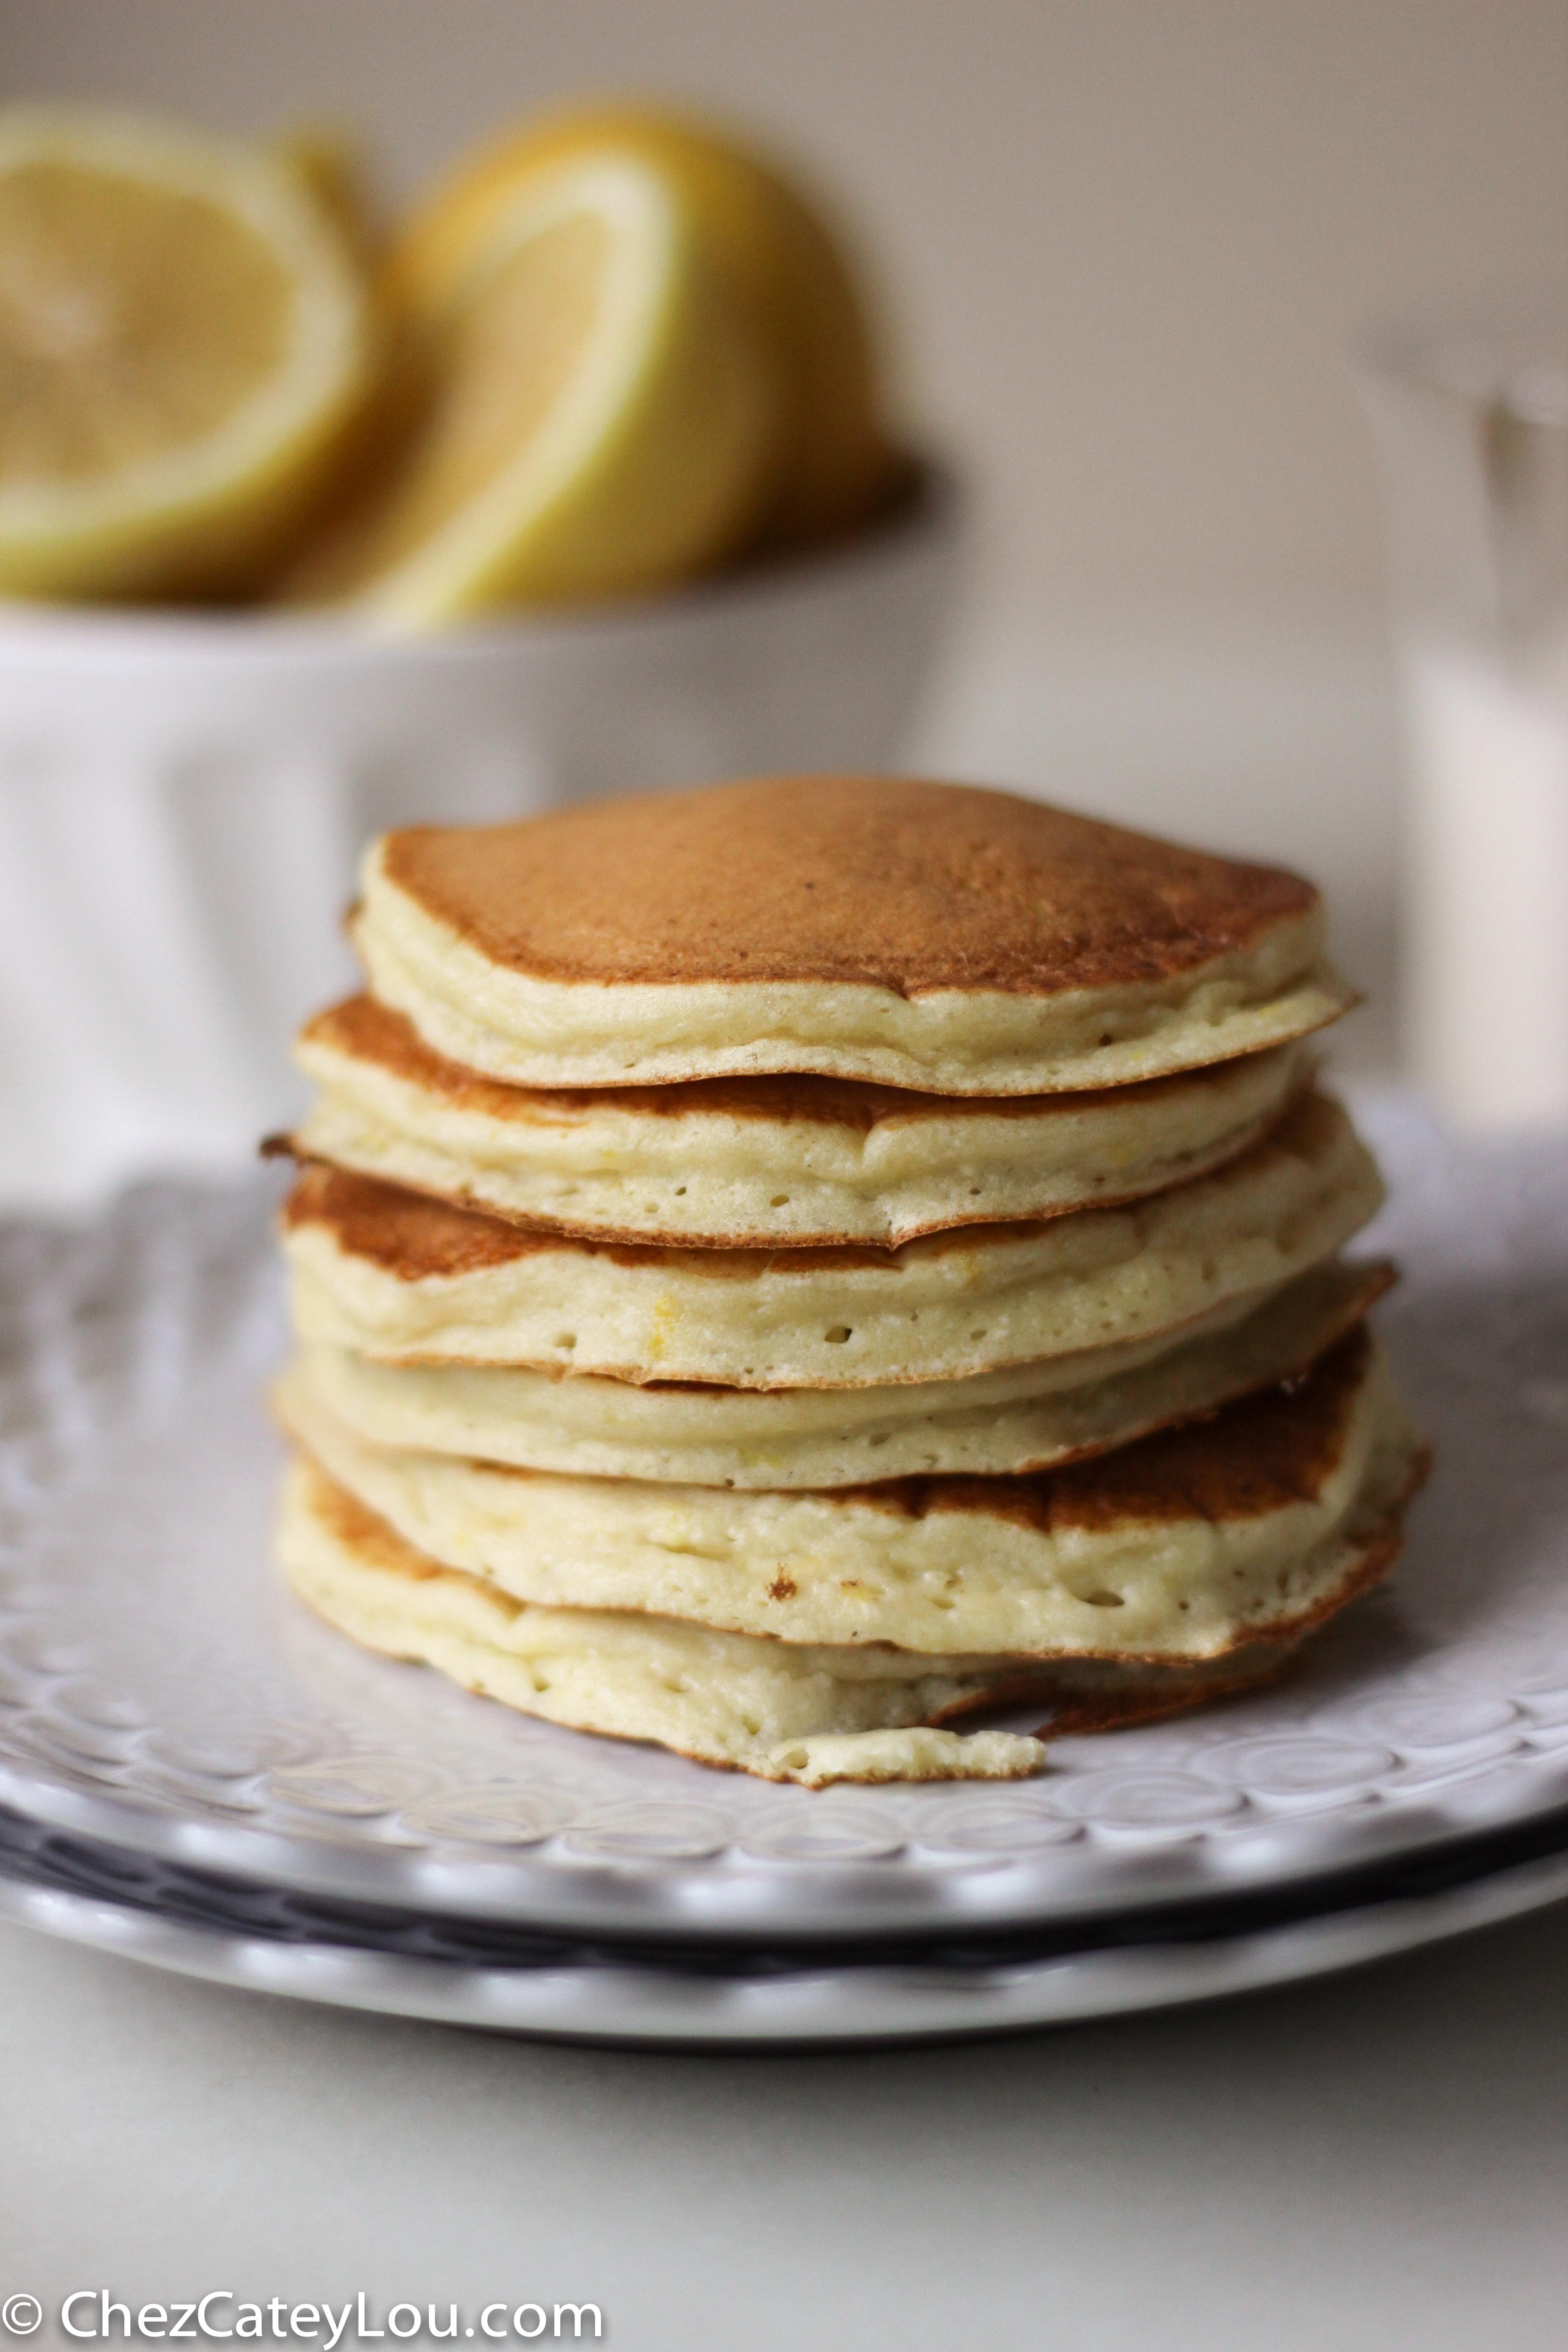 Lemon Ricotta Pancakes - Chez CateyLou